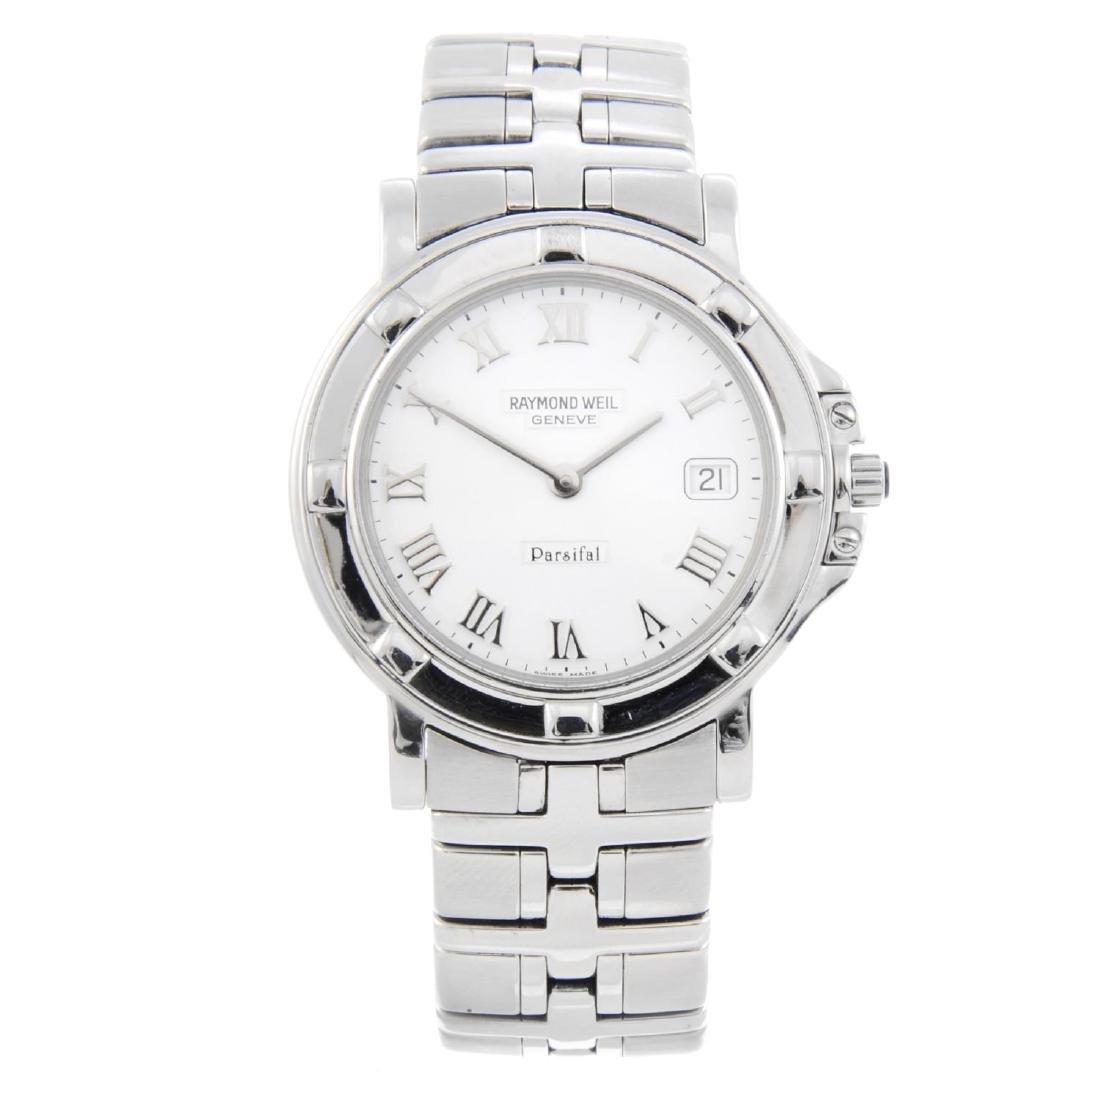 RAYMOND WEIL - a gentleman's Parsifal bracelet watch.